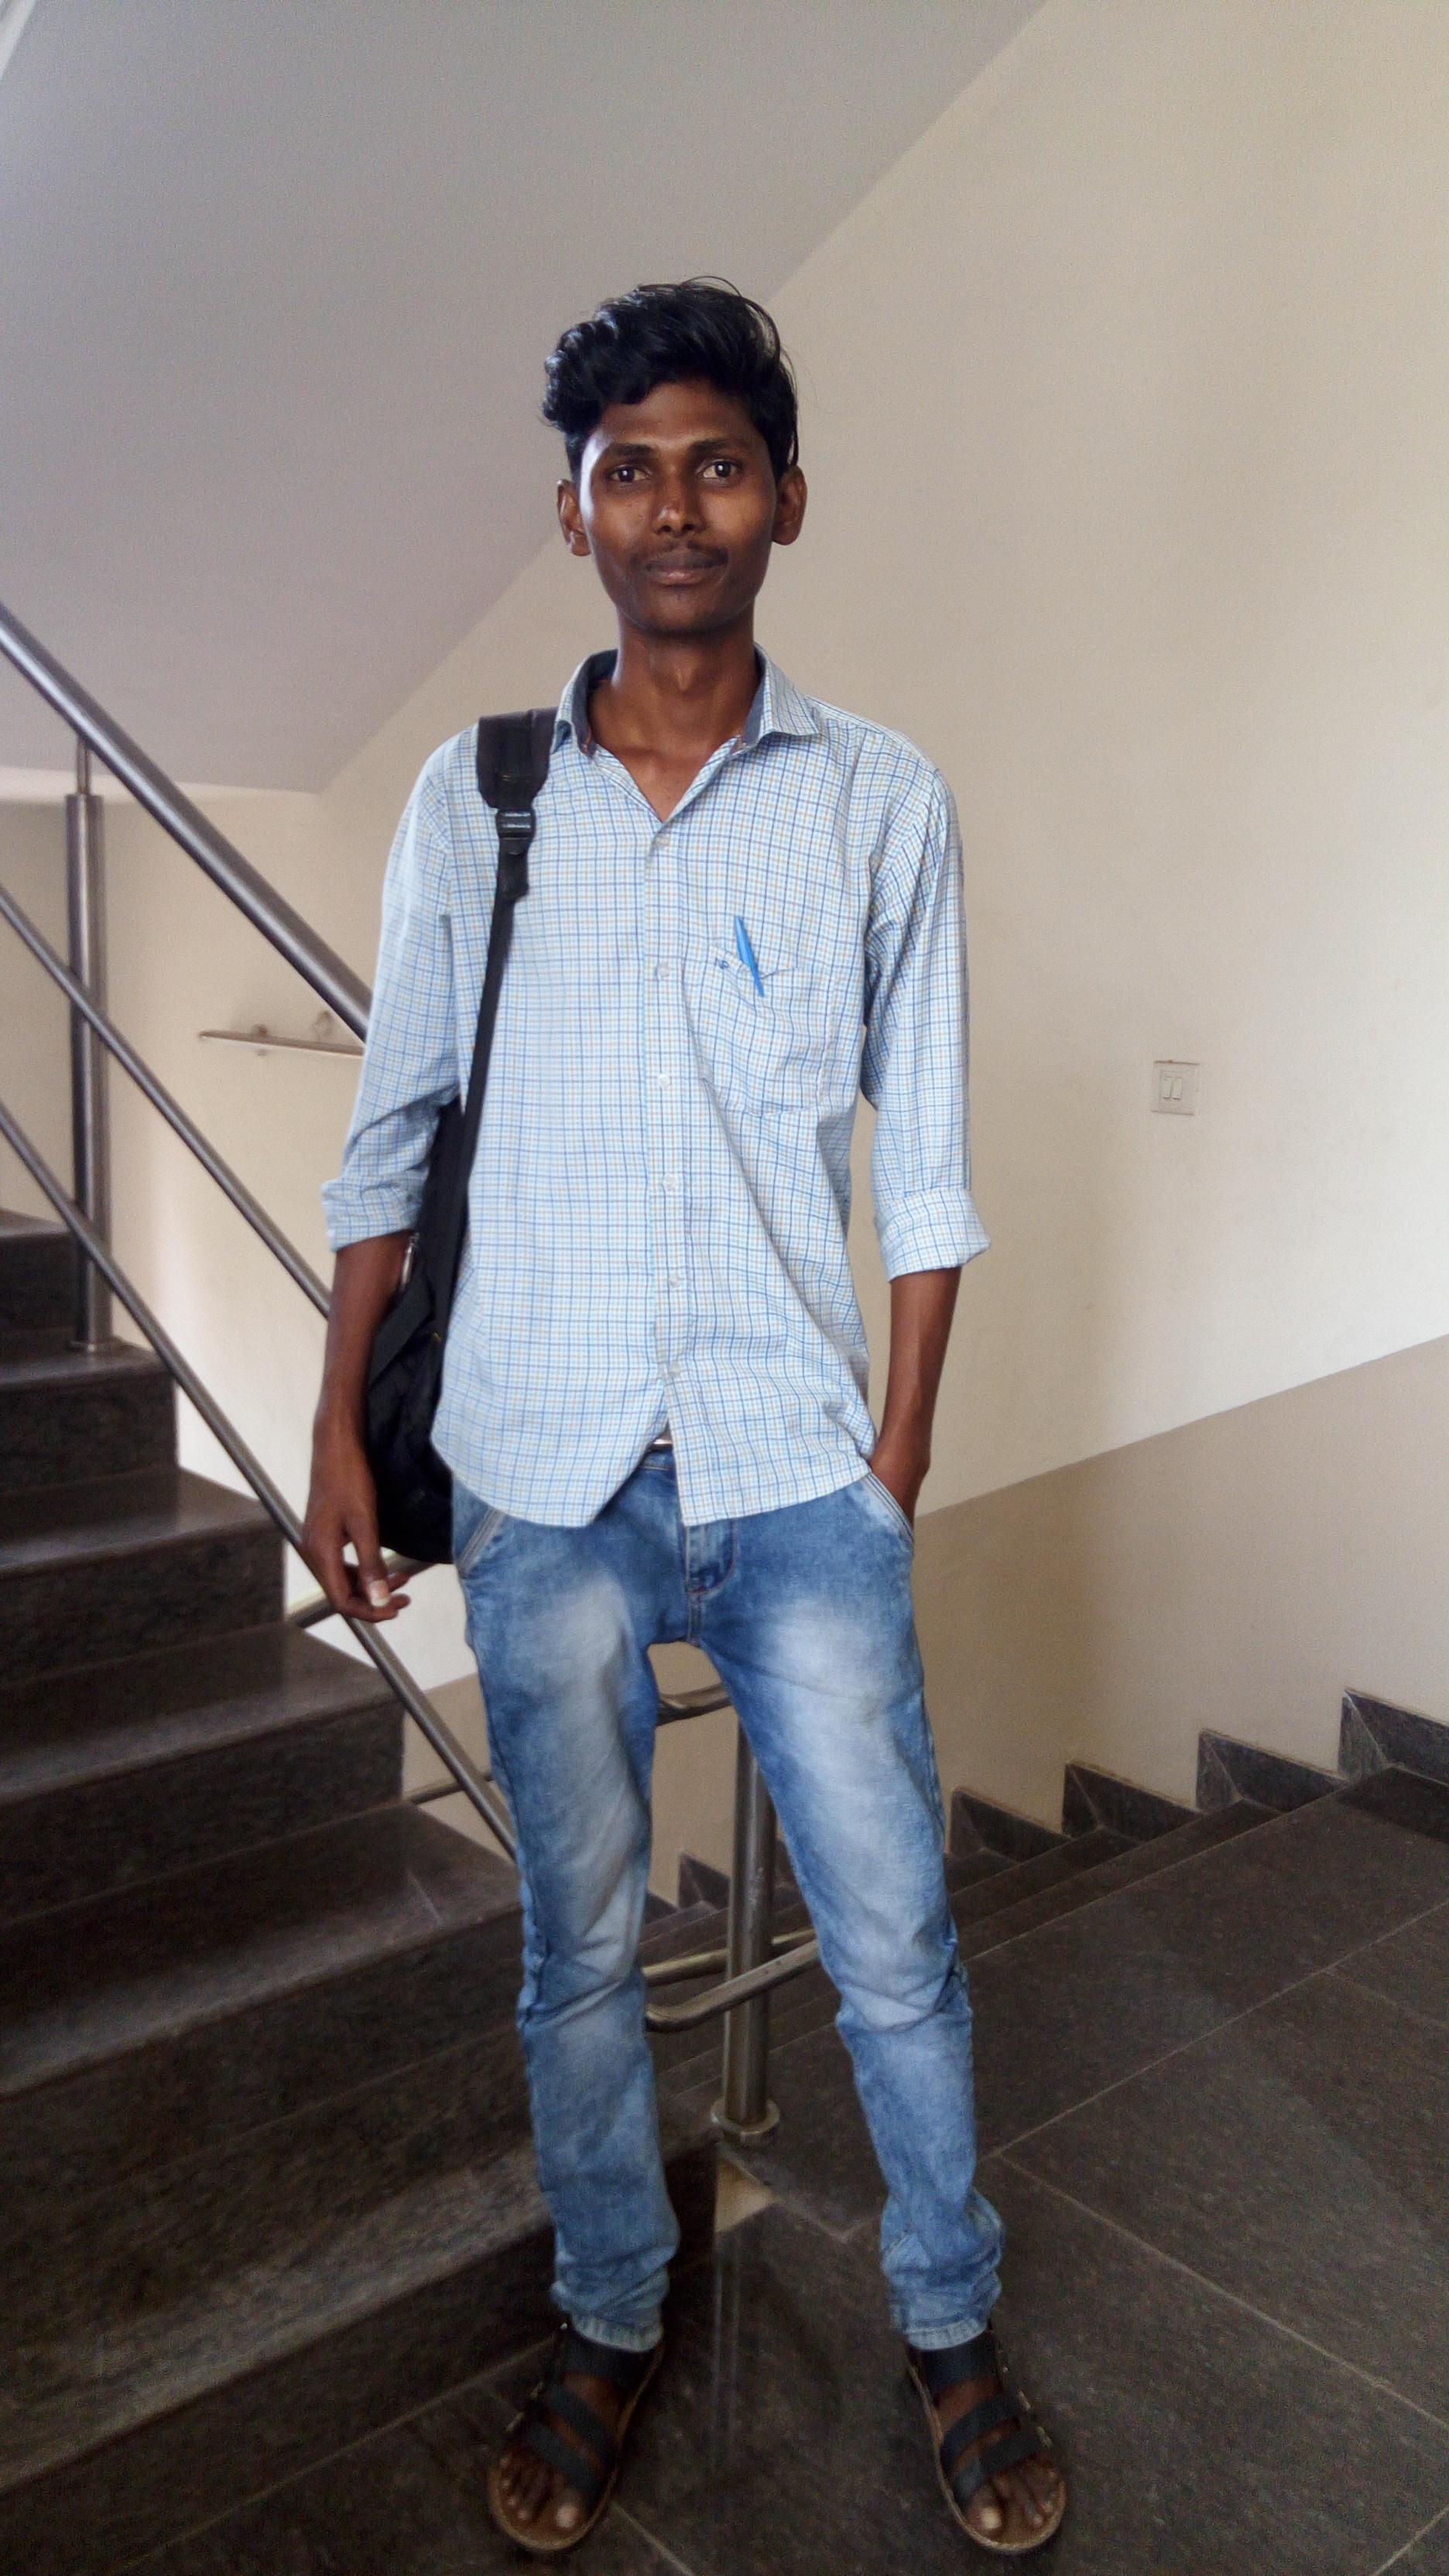 Hemant Dinkar Sawale